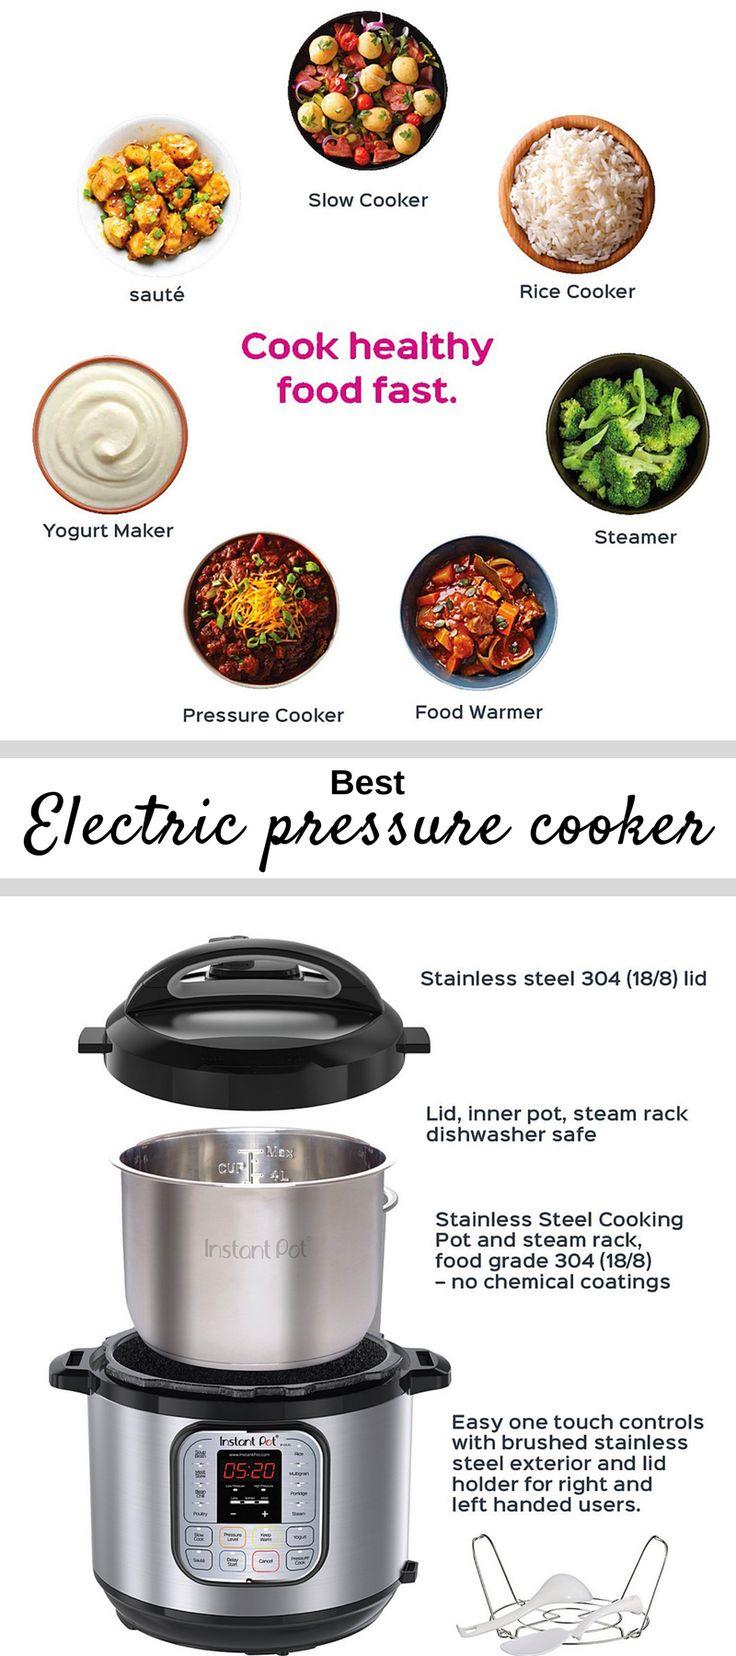 Best electric pressure cooker. With this electric pressure cooker you can cook healthy food fast and eat quicker! #cooker #presurecooker #cookin #cookingtools